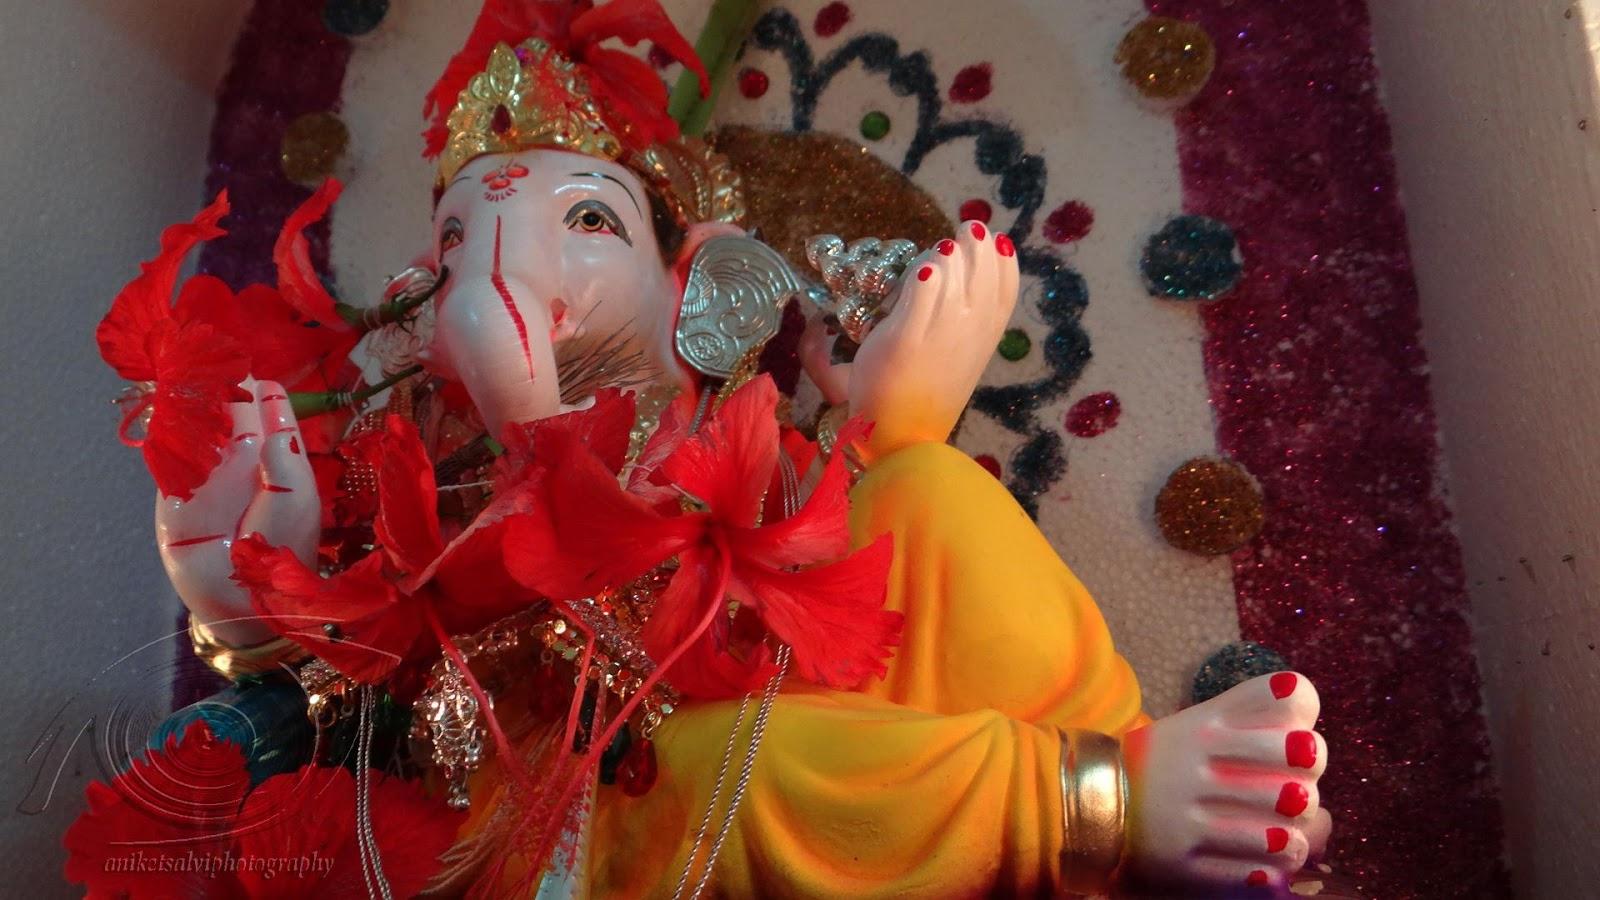 Lord Ganesha Wallpapers HD 4K V3.0 APK Download